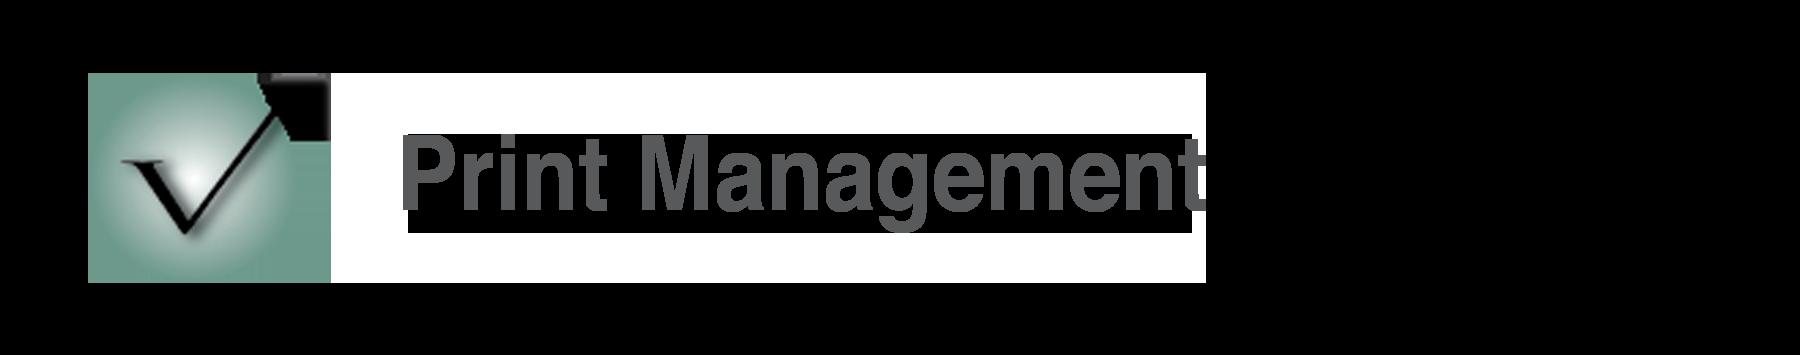 PrintManagement-New